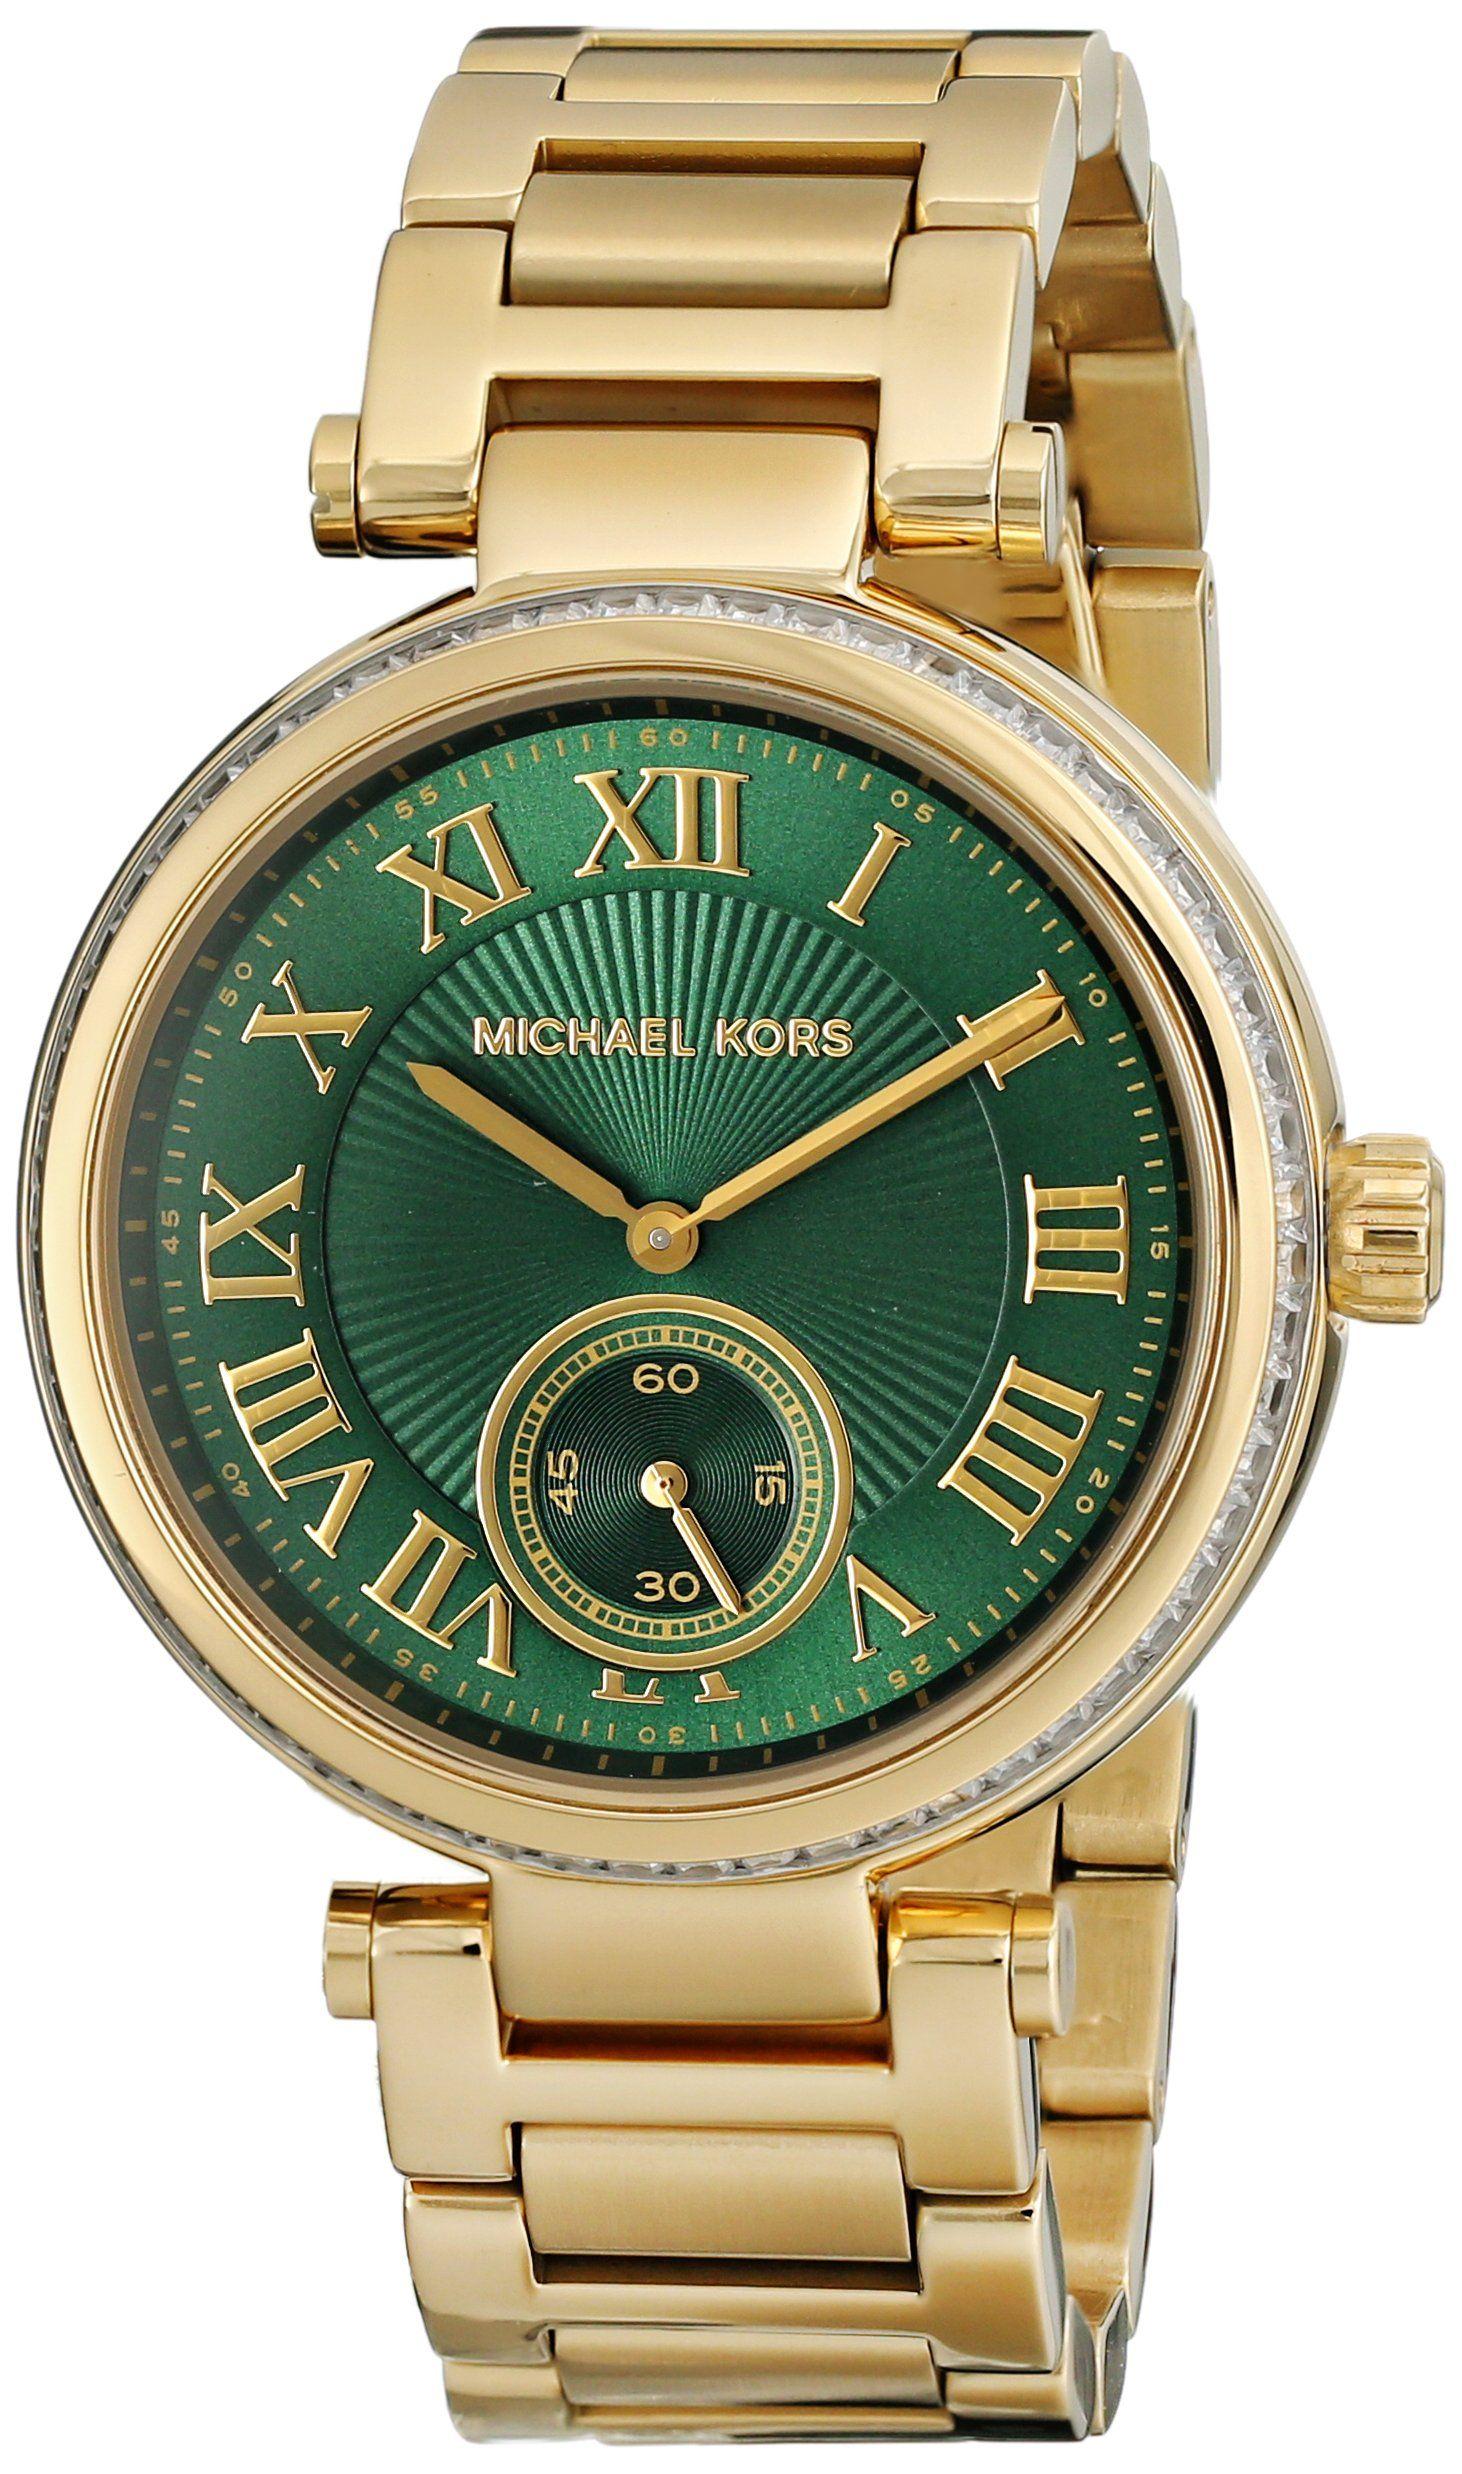 4d1f5e5df934 Reloj Michael Kors Skylar Mk6065 Mujer Verde  Amazon.es  Relojes ...